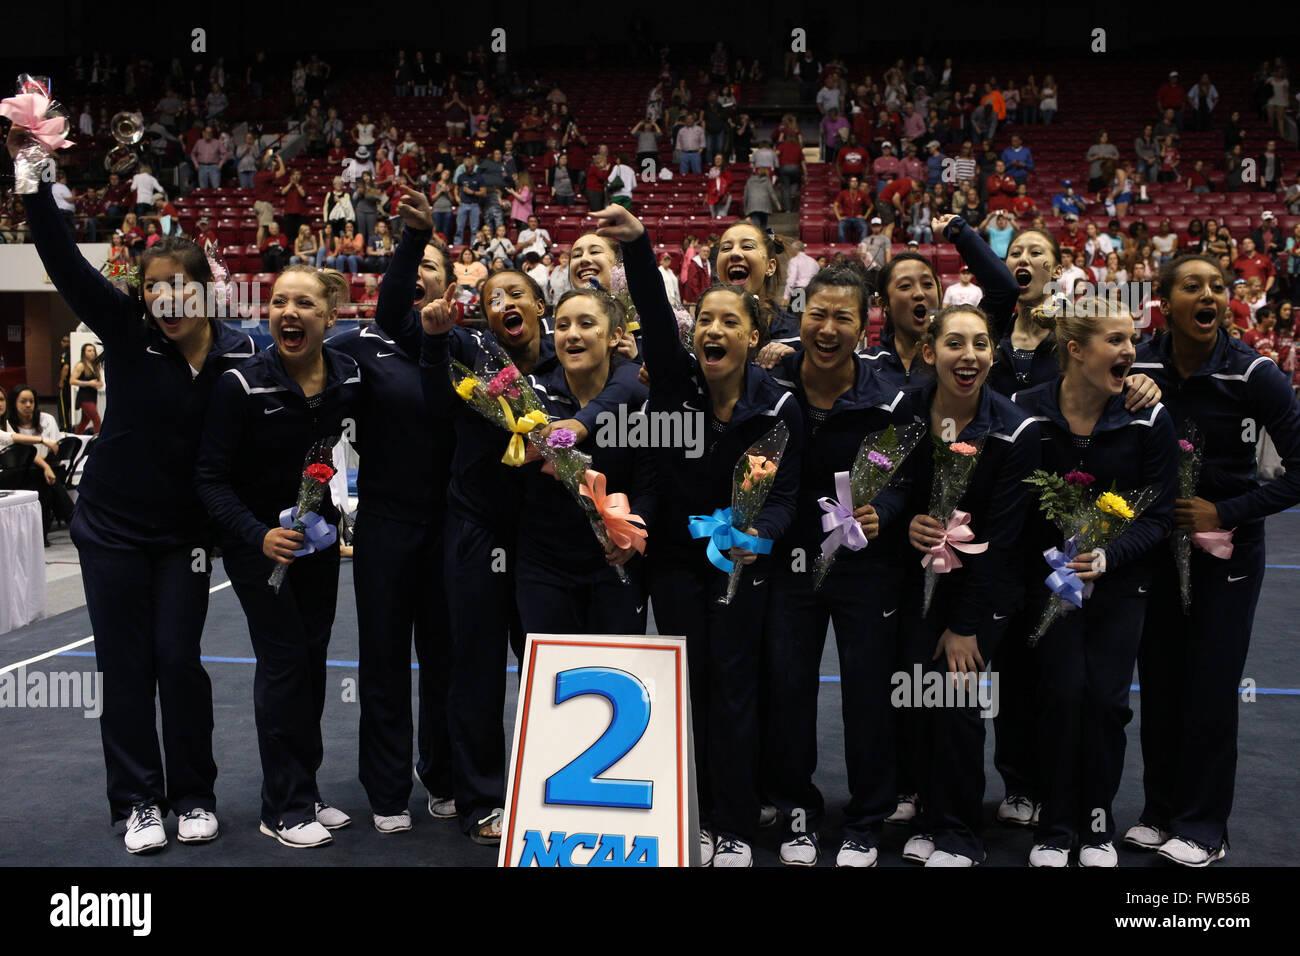 April 2, 2016: The University of California Berkeley gymnastics team celebrates at the NCAA Tuscaloosa Regional - Stock Image